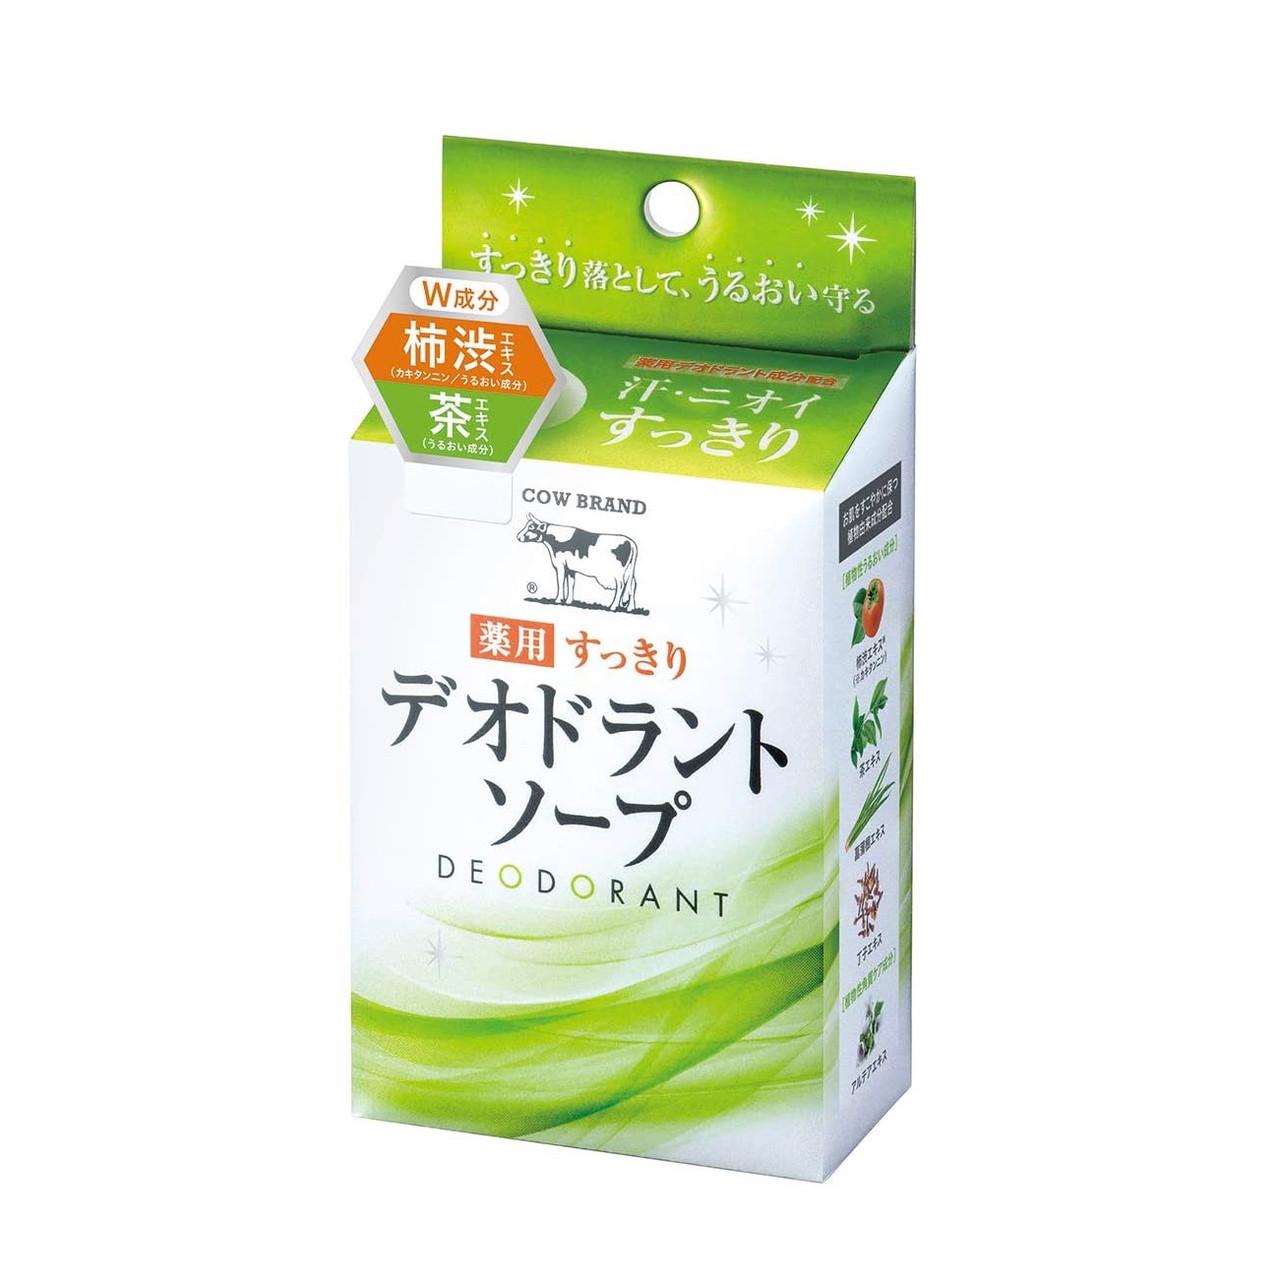 Cow Brand Deodorant Soap — мыло-деодорант